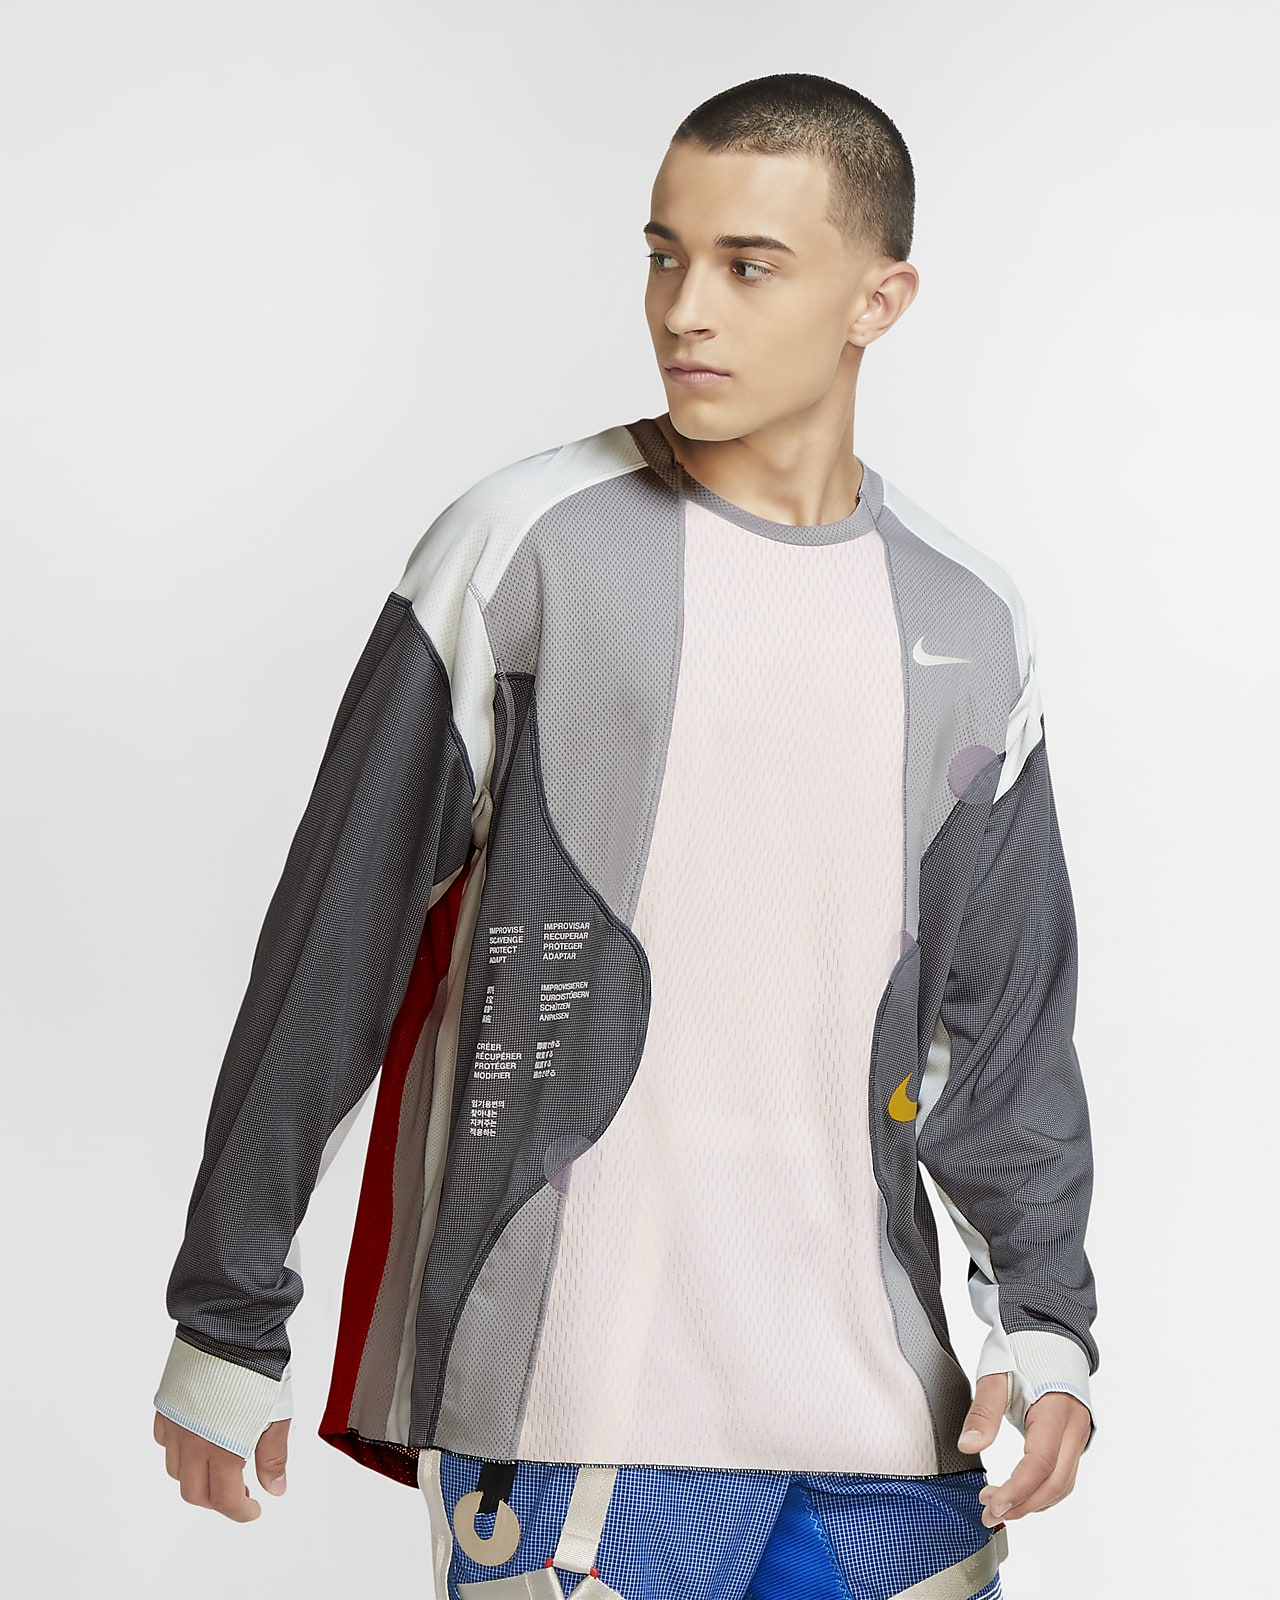 Nike Dri-FIT ISPA Long-Sleeve Top